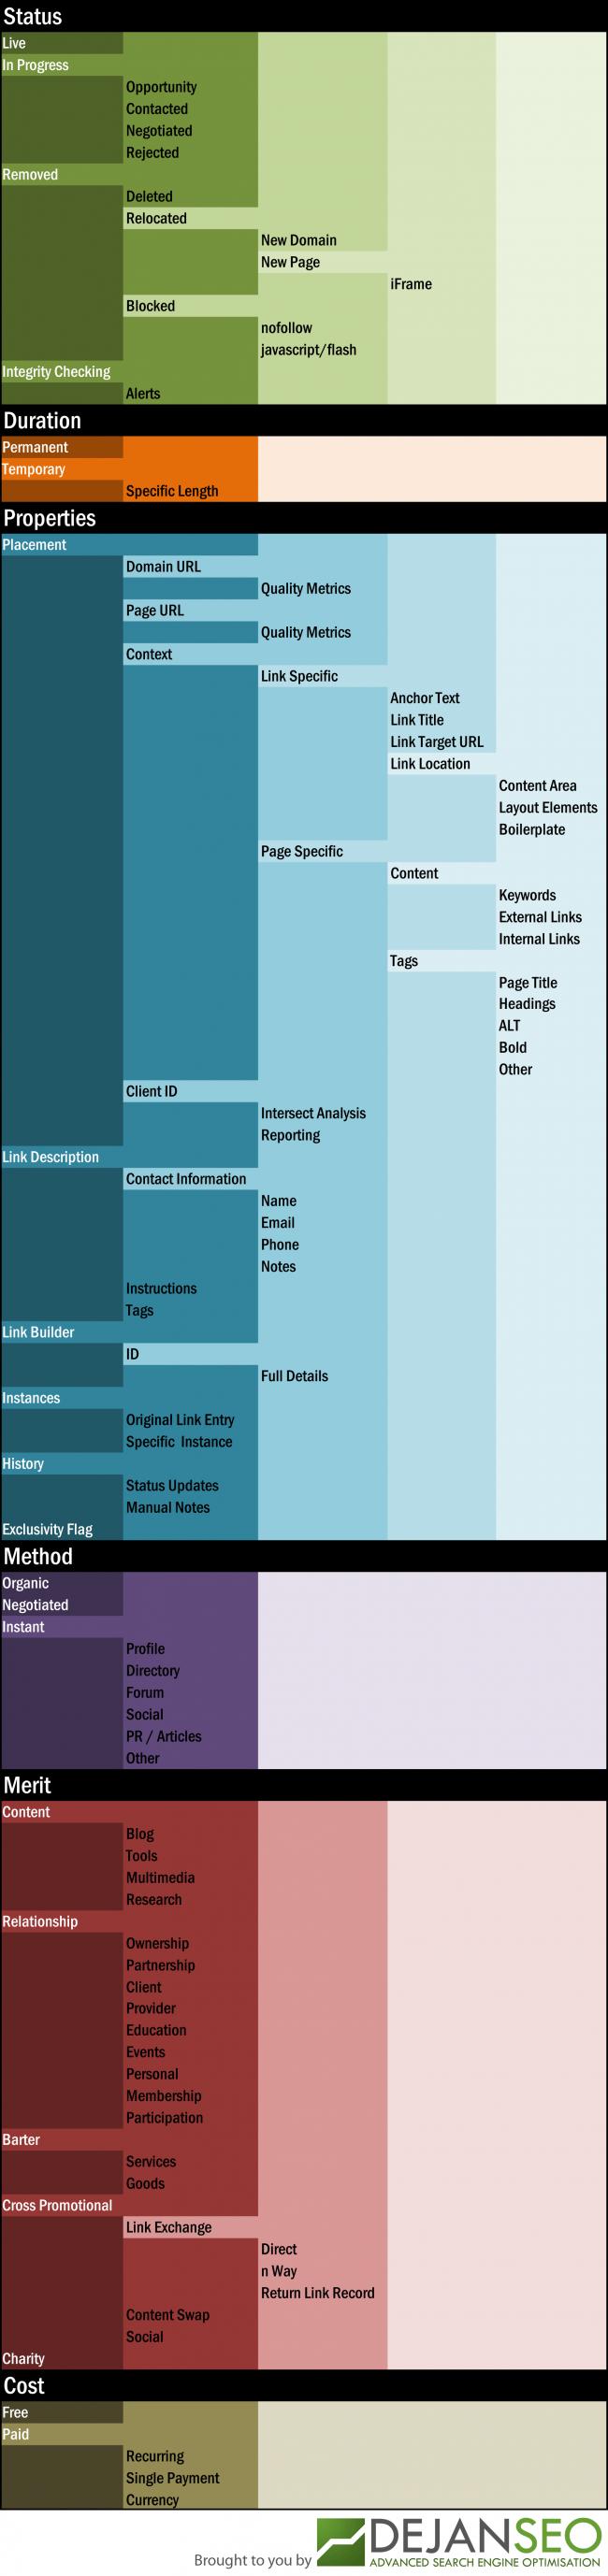 Deyan SEO: Link Anatomy Visualisation